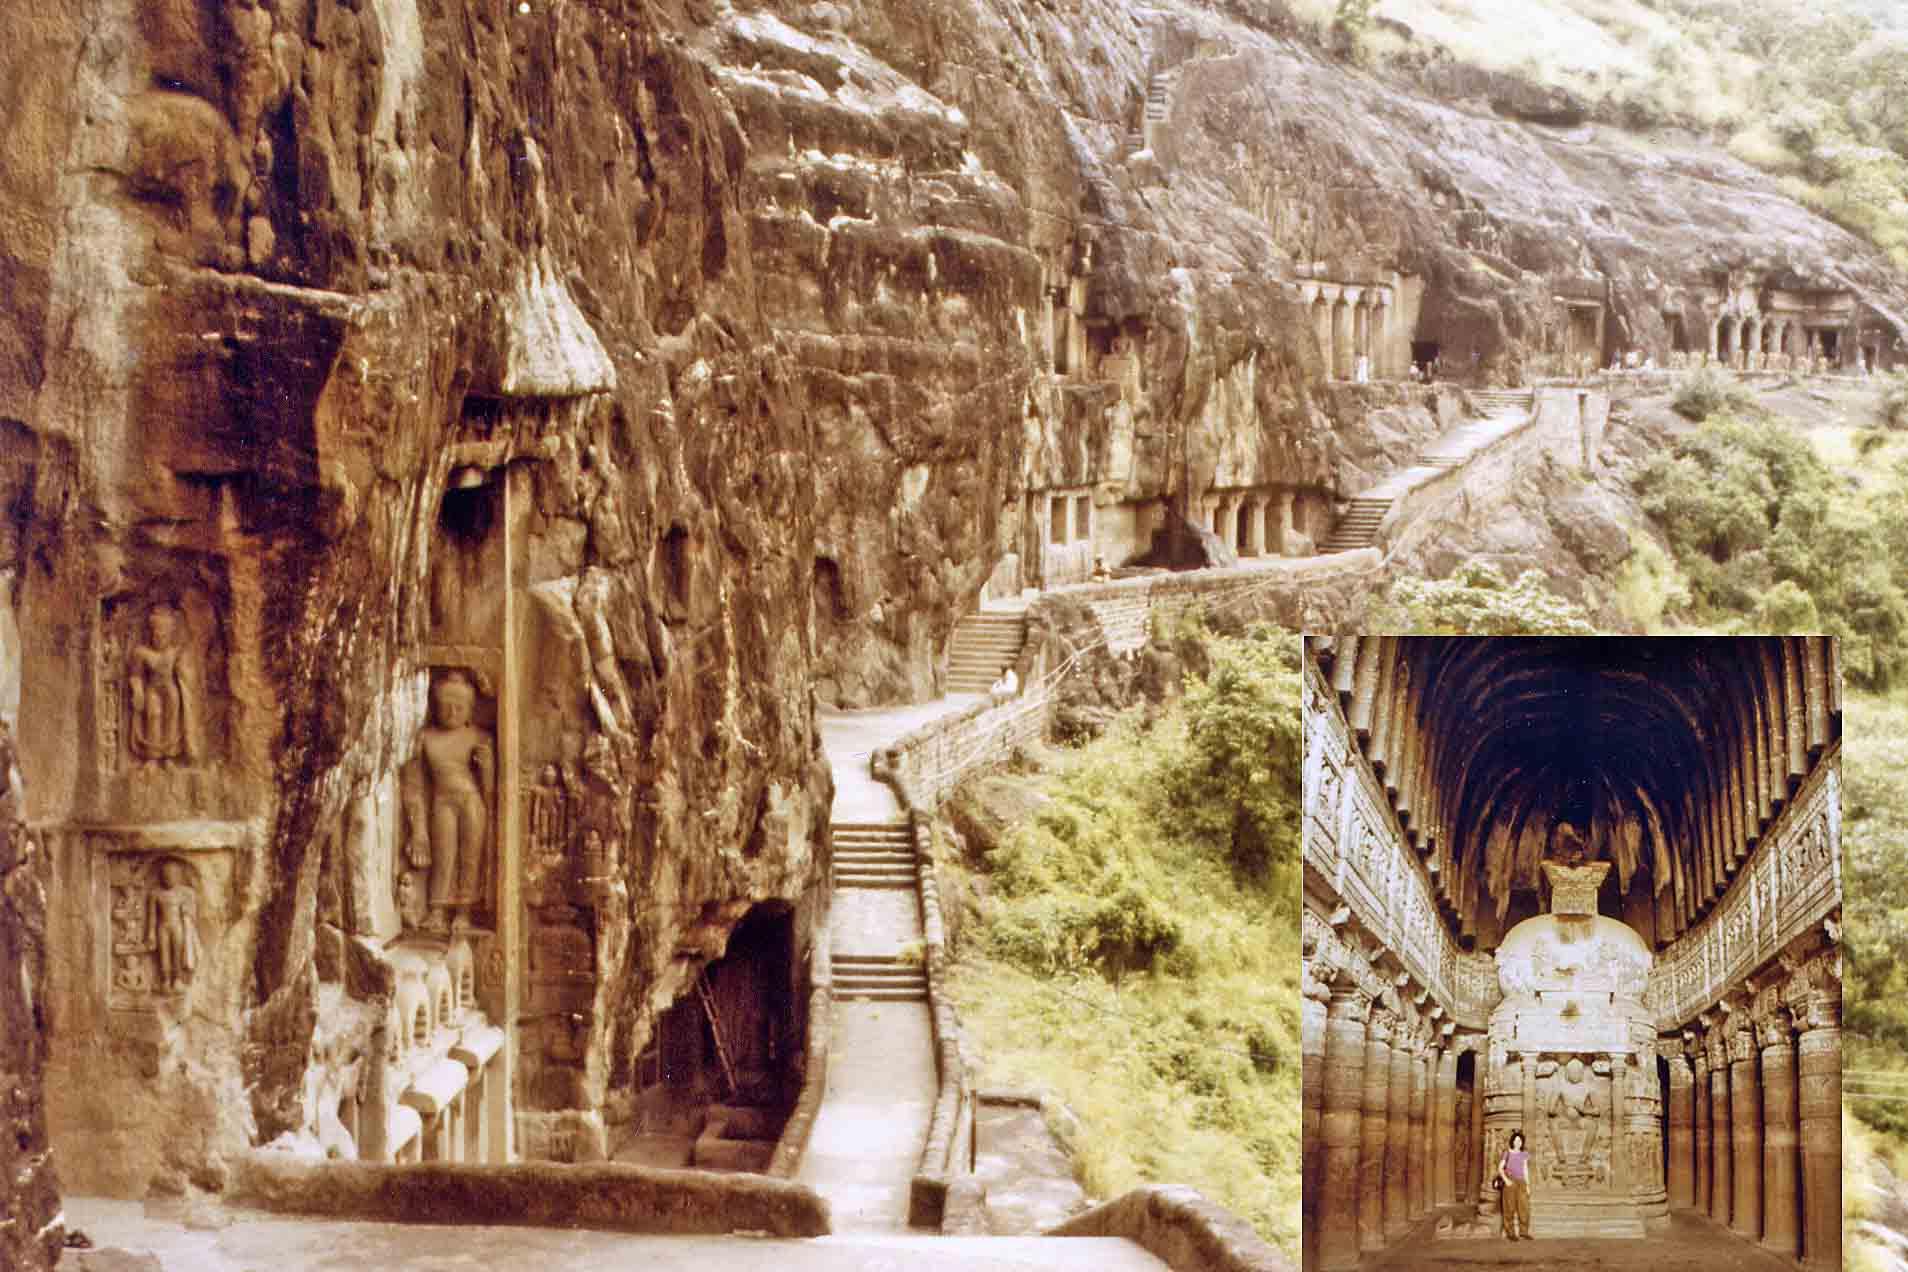 Temple in caves in Ajanta